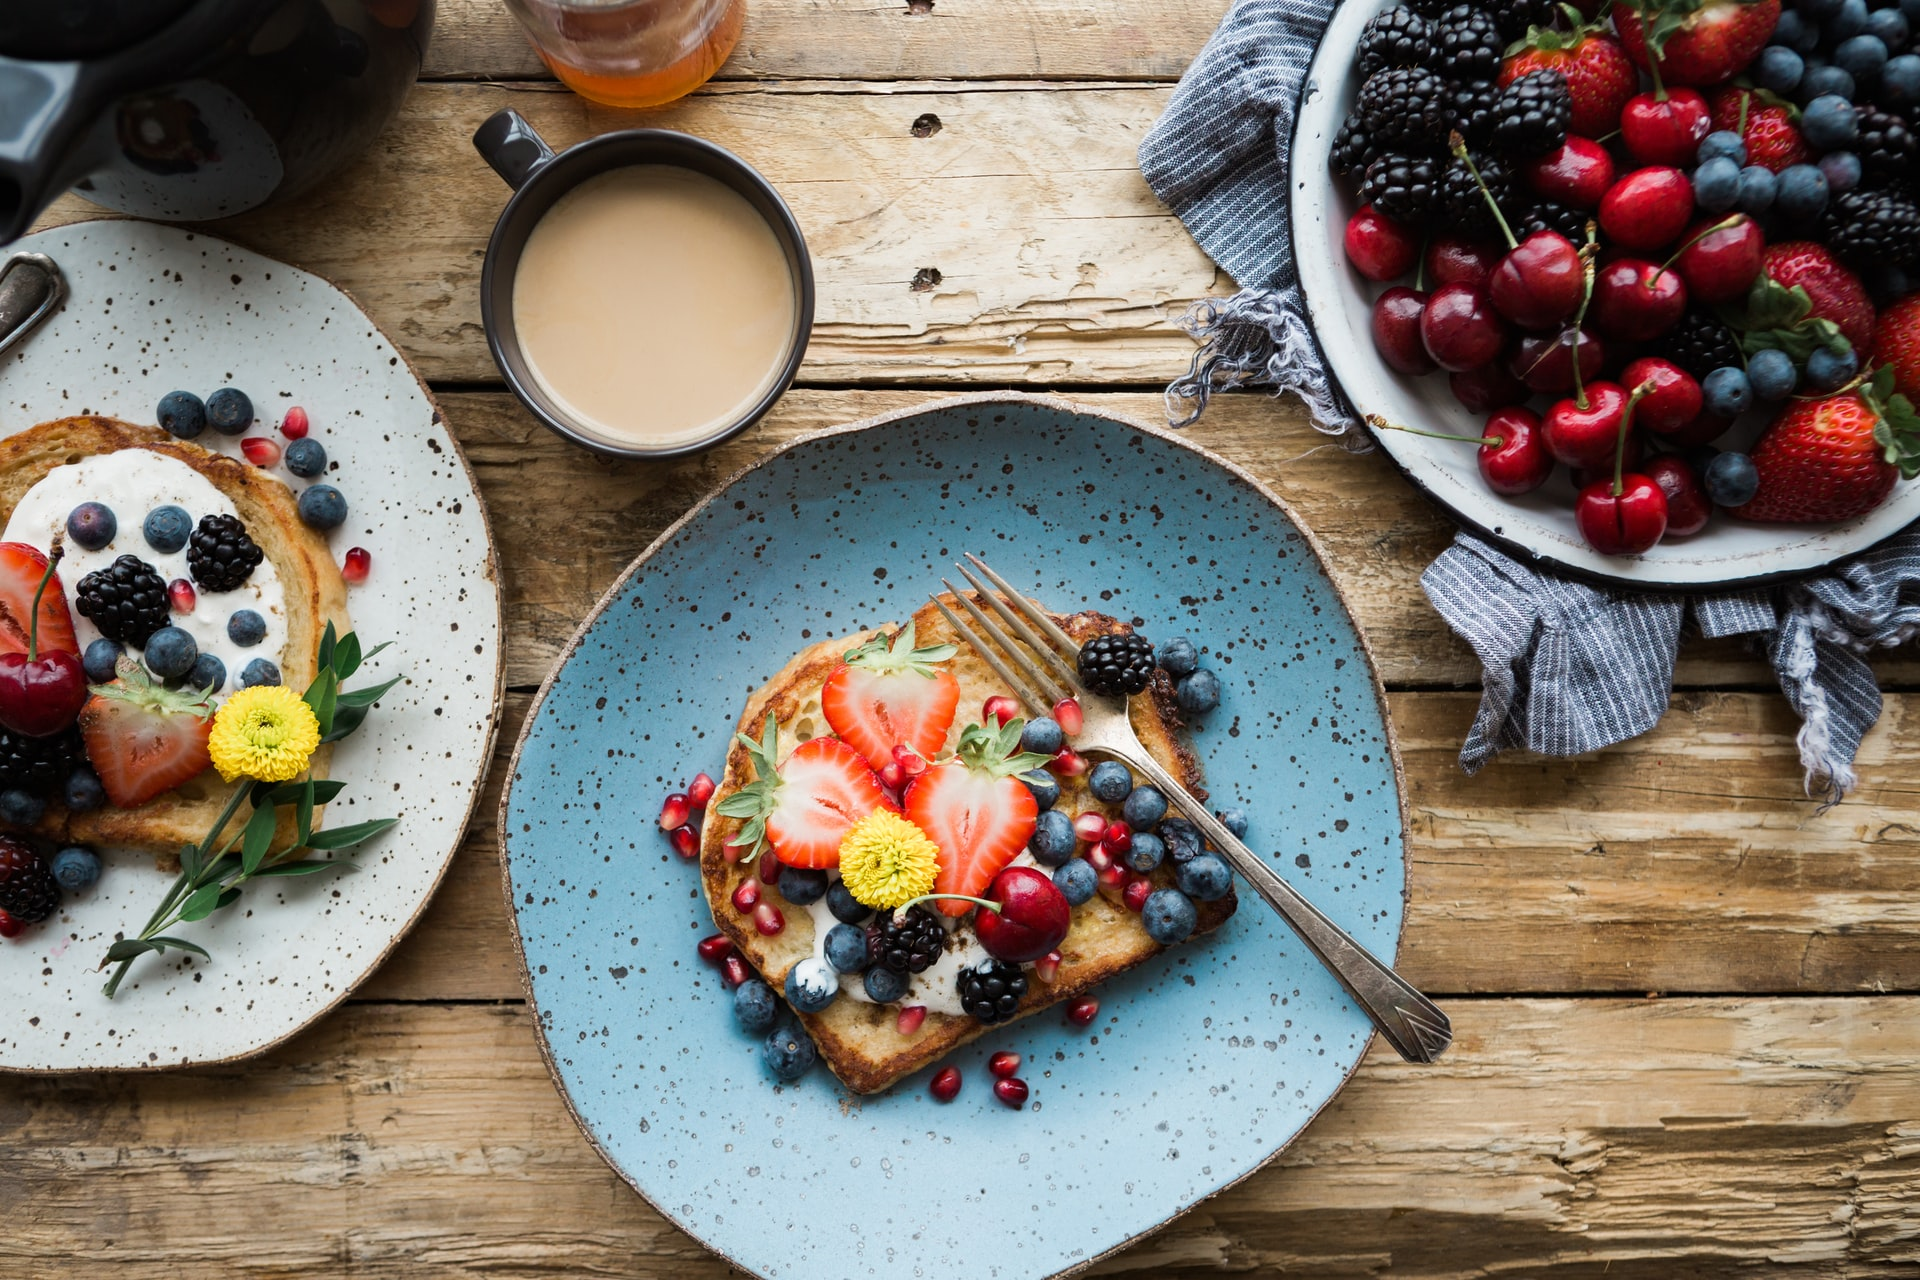 10 Best for Breakfast and Brunch in San Antonio